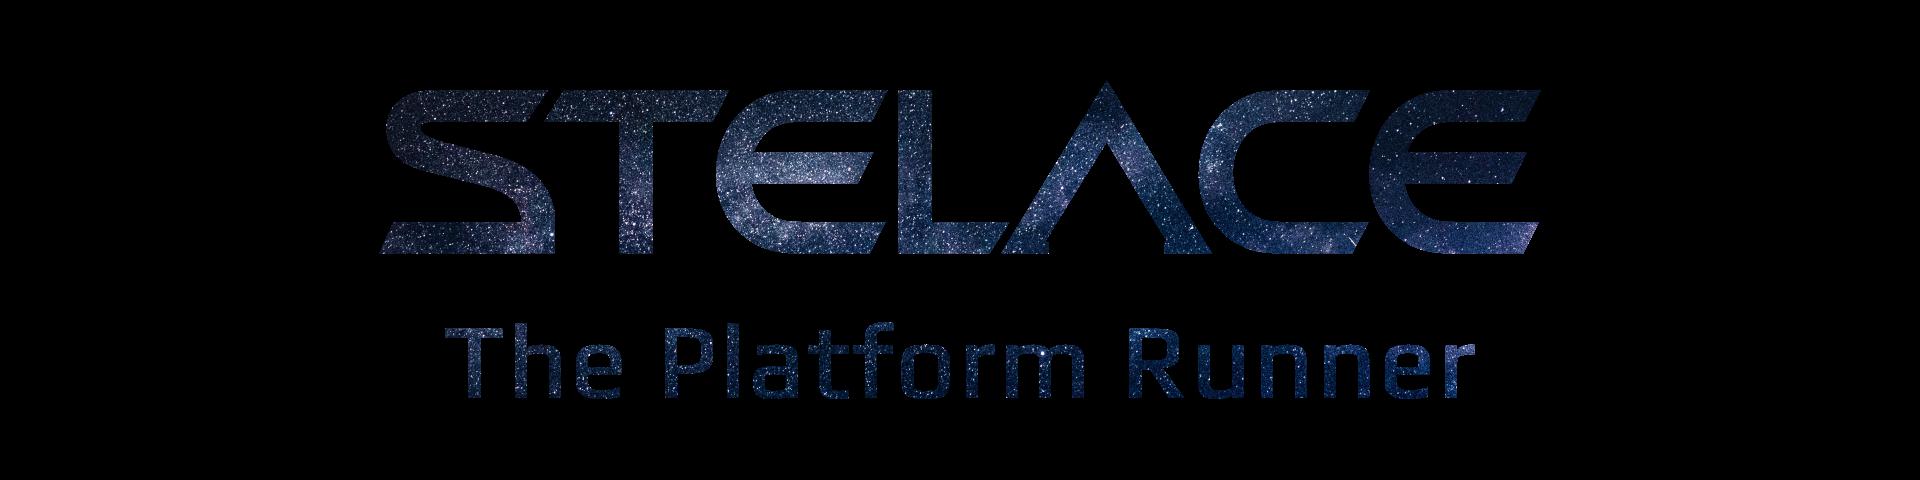 Stelace-platform-runner